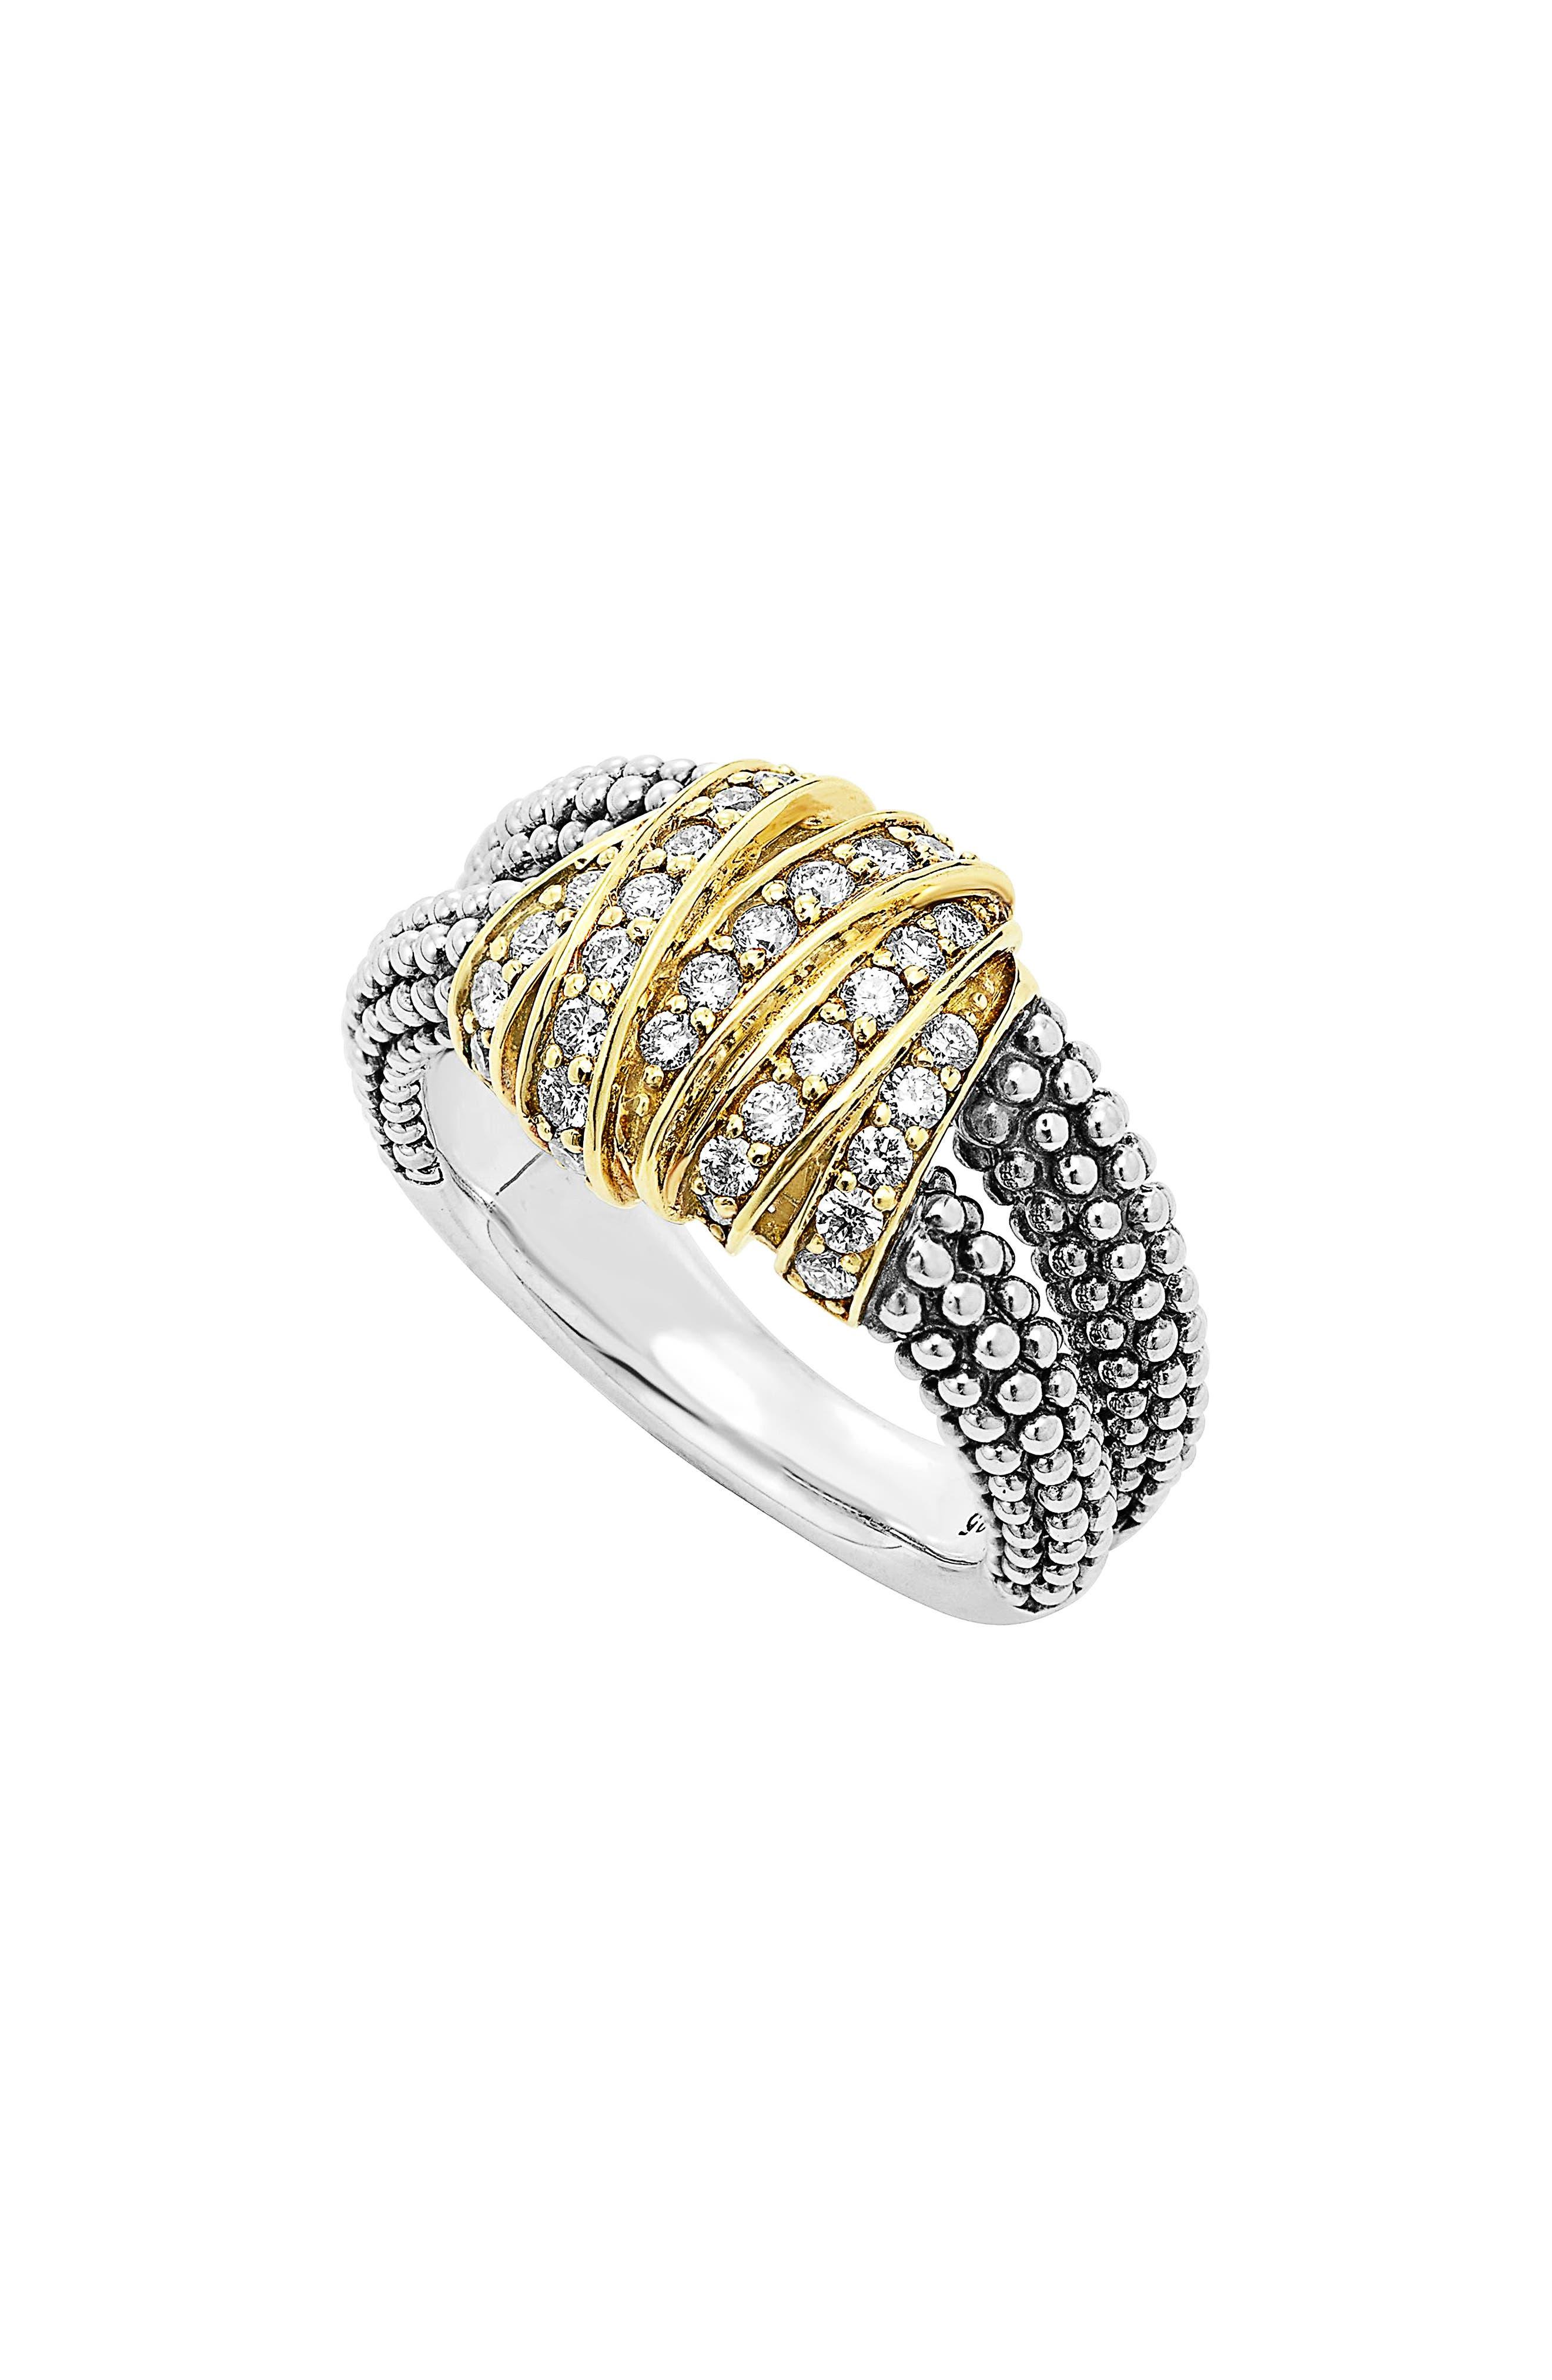 'Diamonds & Caviar' Medium Diamond Ring,                             Main thumbnail 1, color,                             Sterling Silver/ Gold